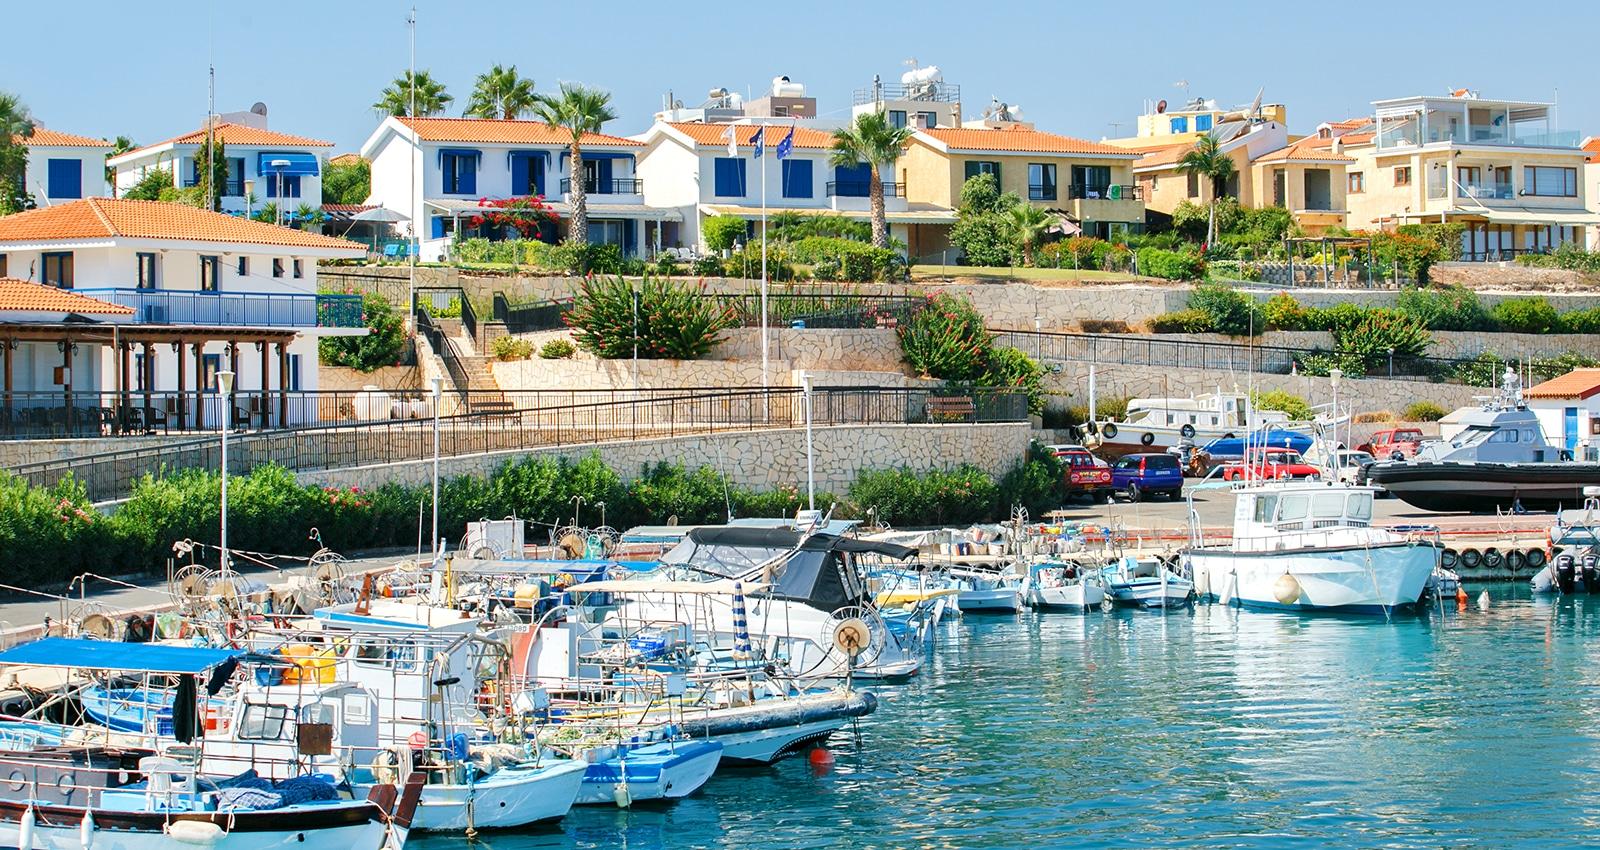 Marina in protaros - Cyprus-1